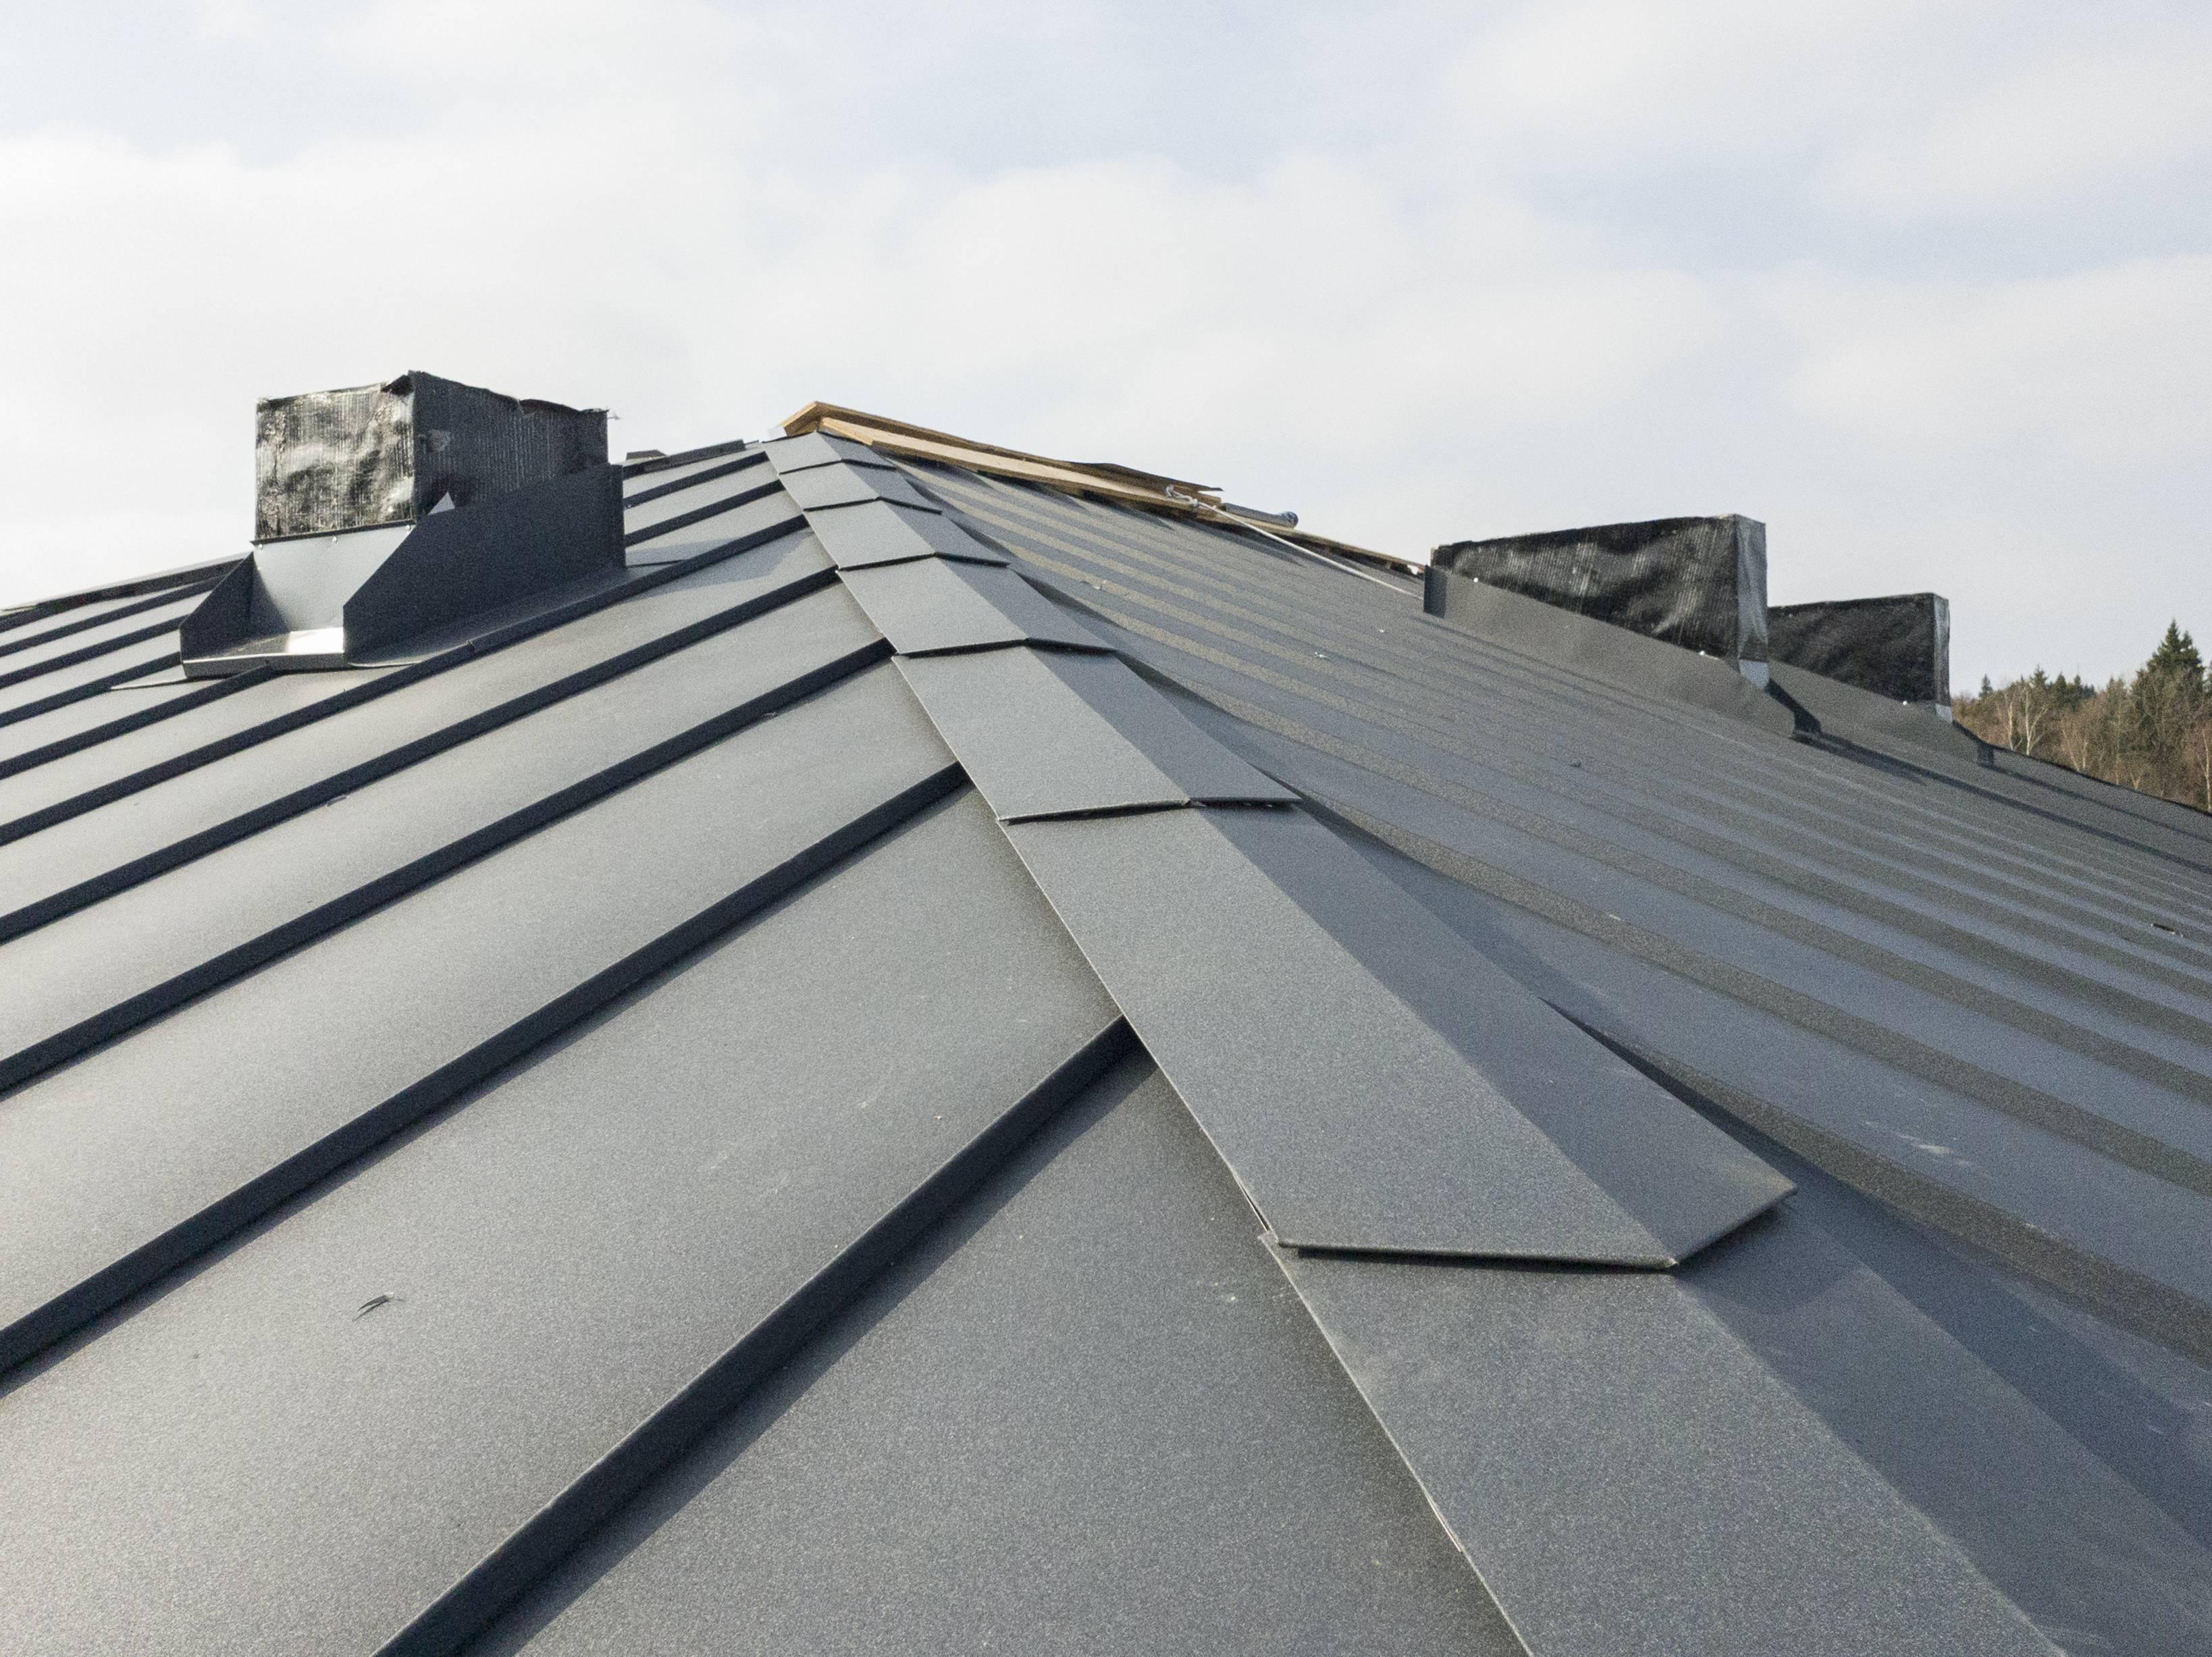 travaux couvreur toiture